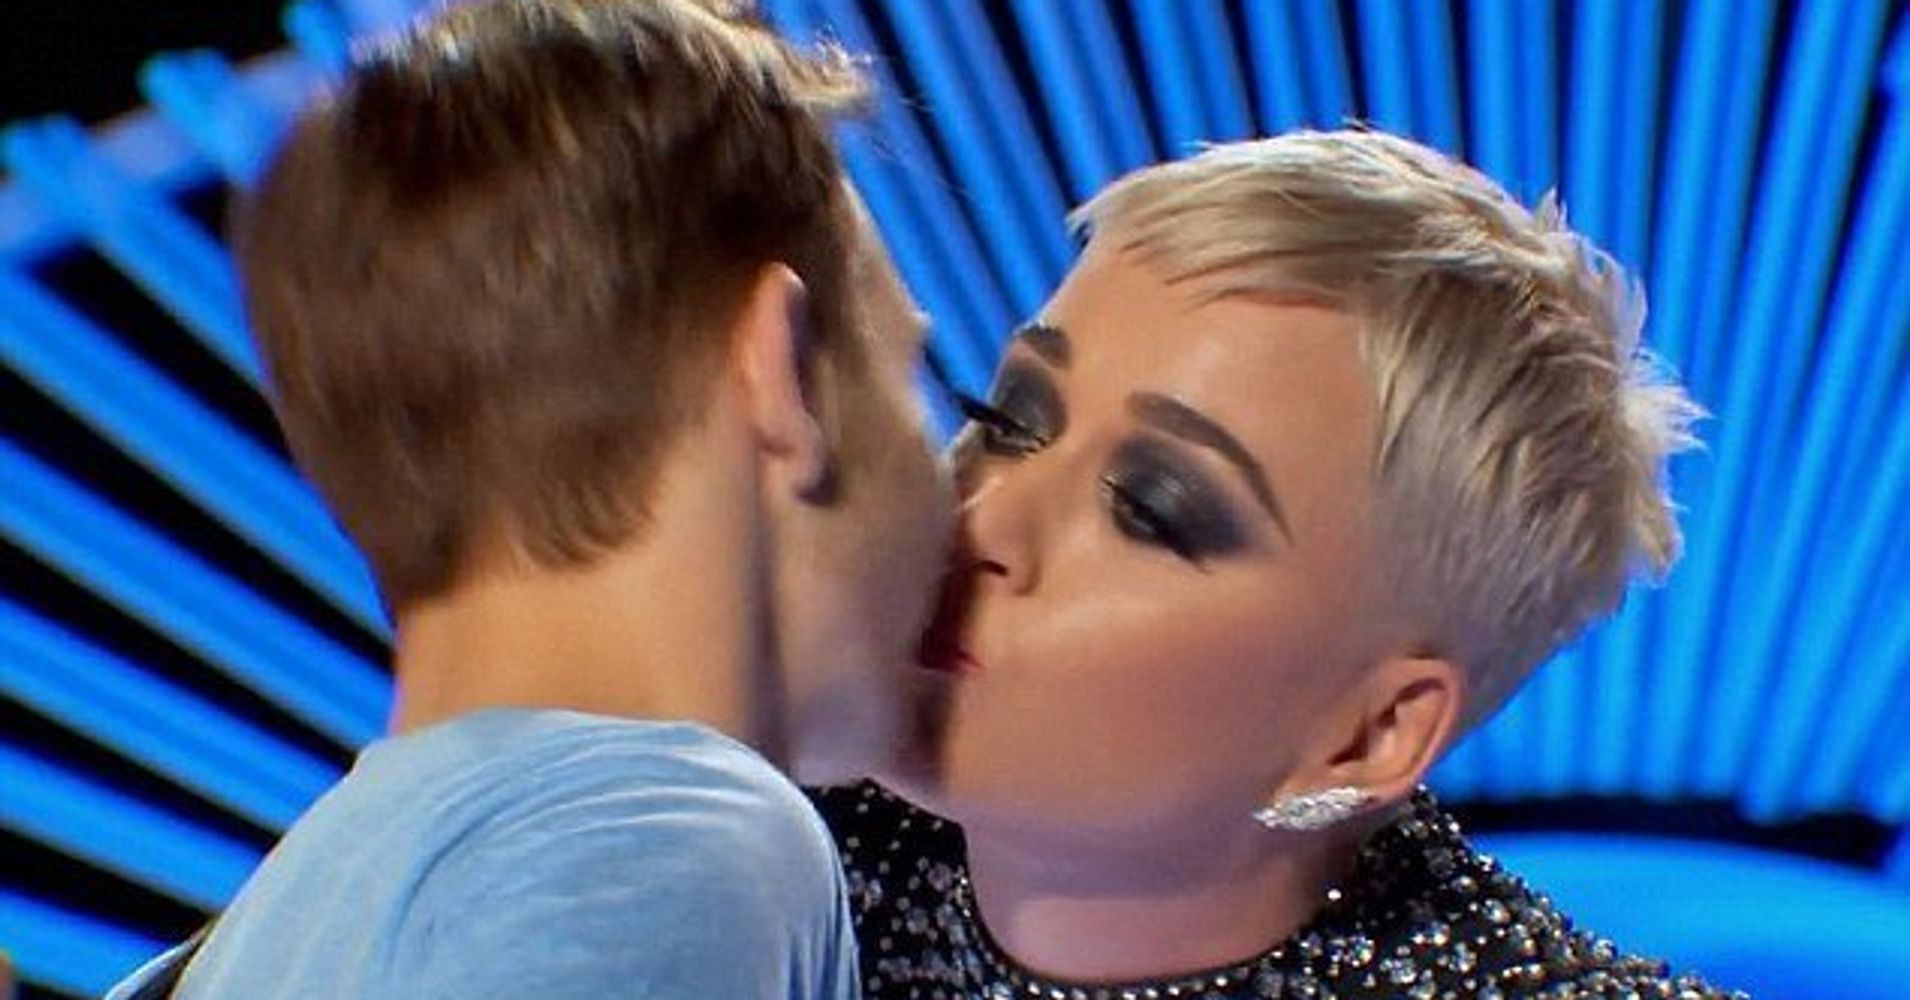 Man Katy Perry Kissed On 'American Idol' Says He Didn't Like It